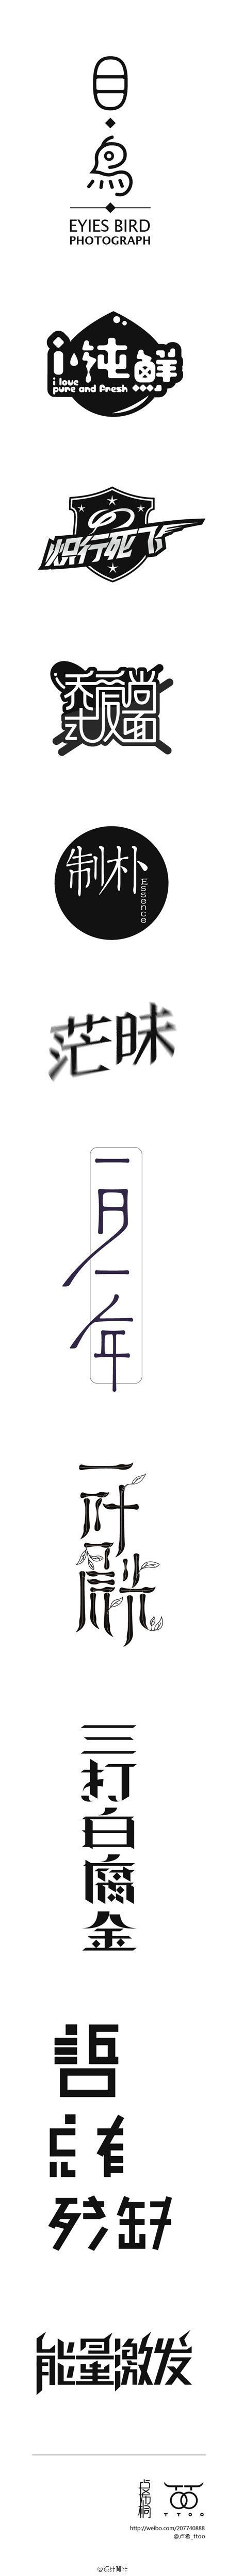 word  - chinese typography - #chinese #Typography #word #chinesetypography word  - chinese typography - #chinese #Typography #word #chinesetypography